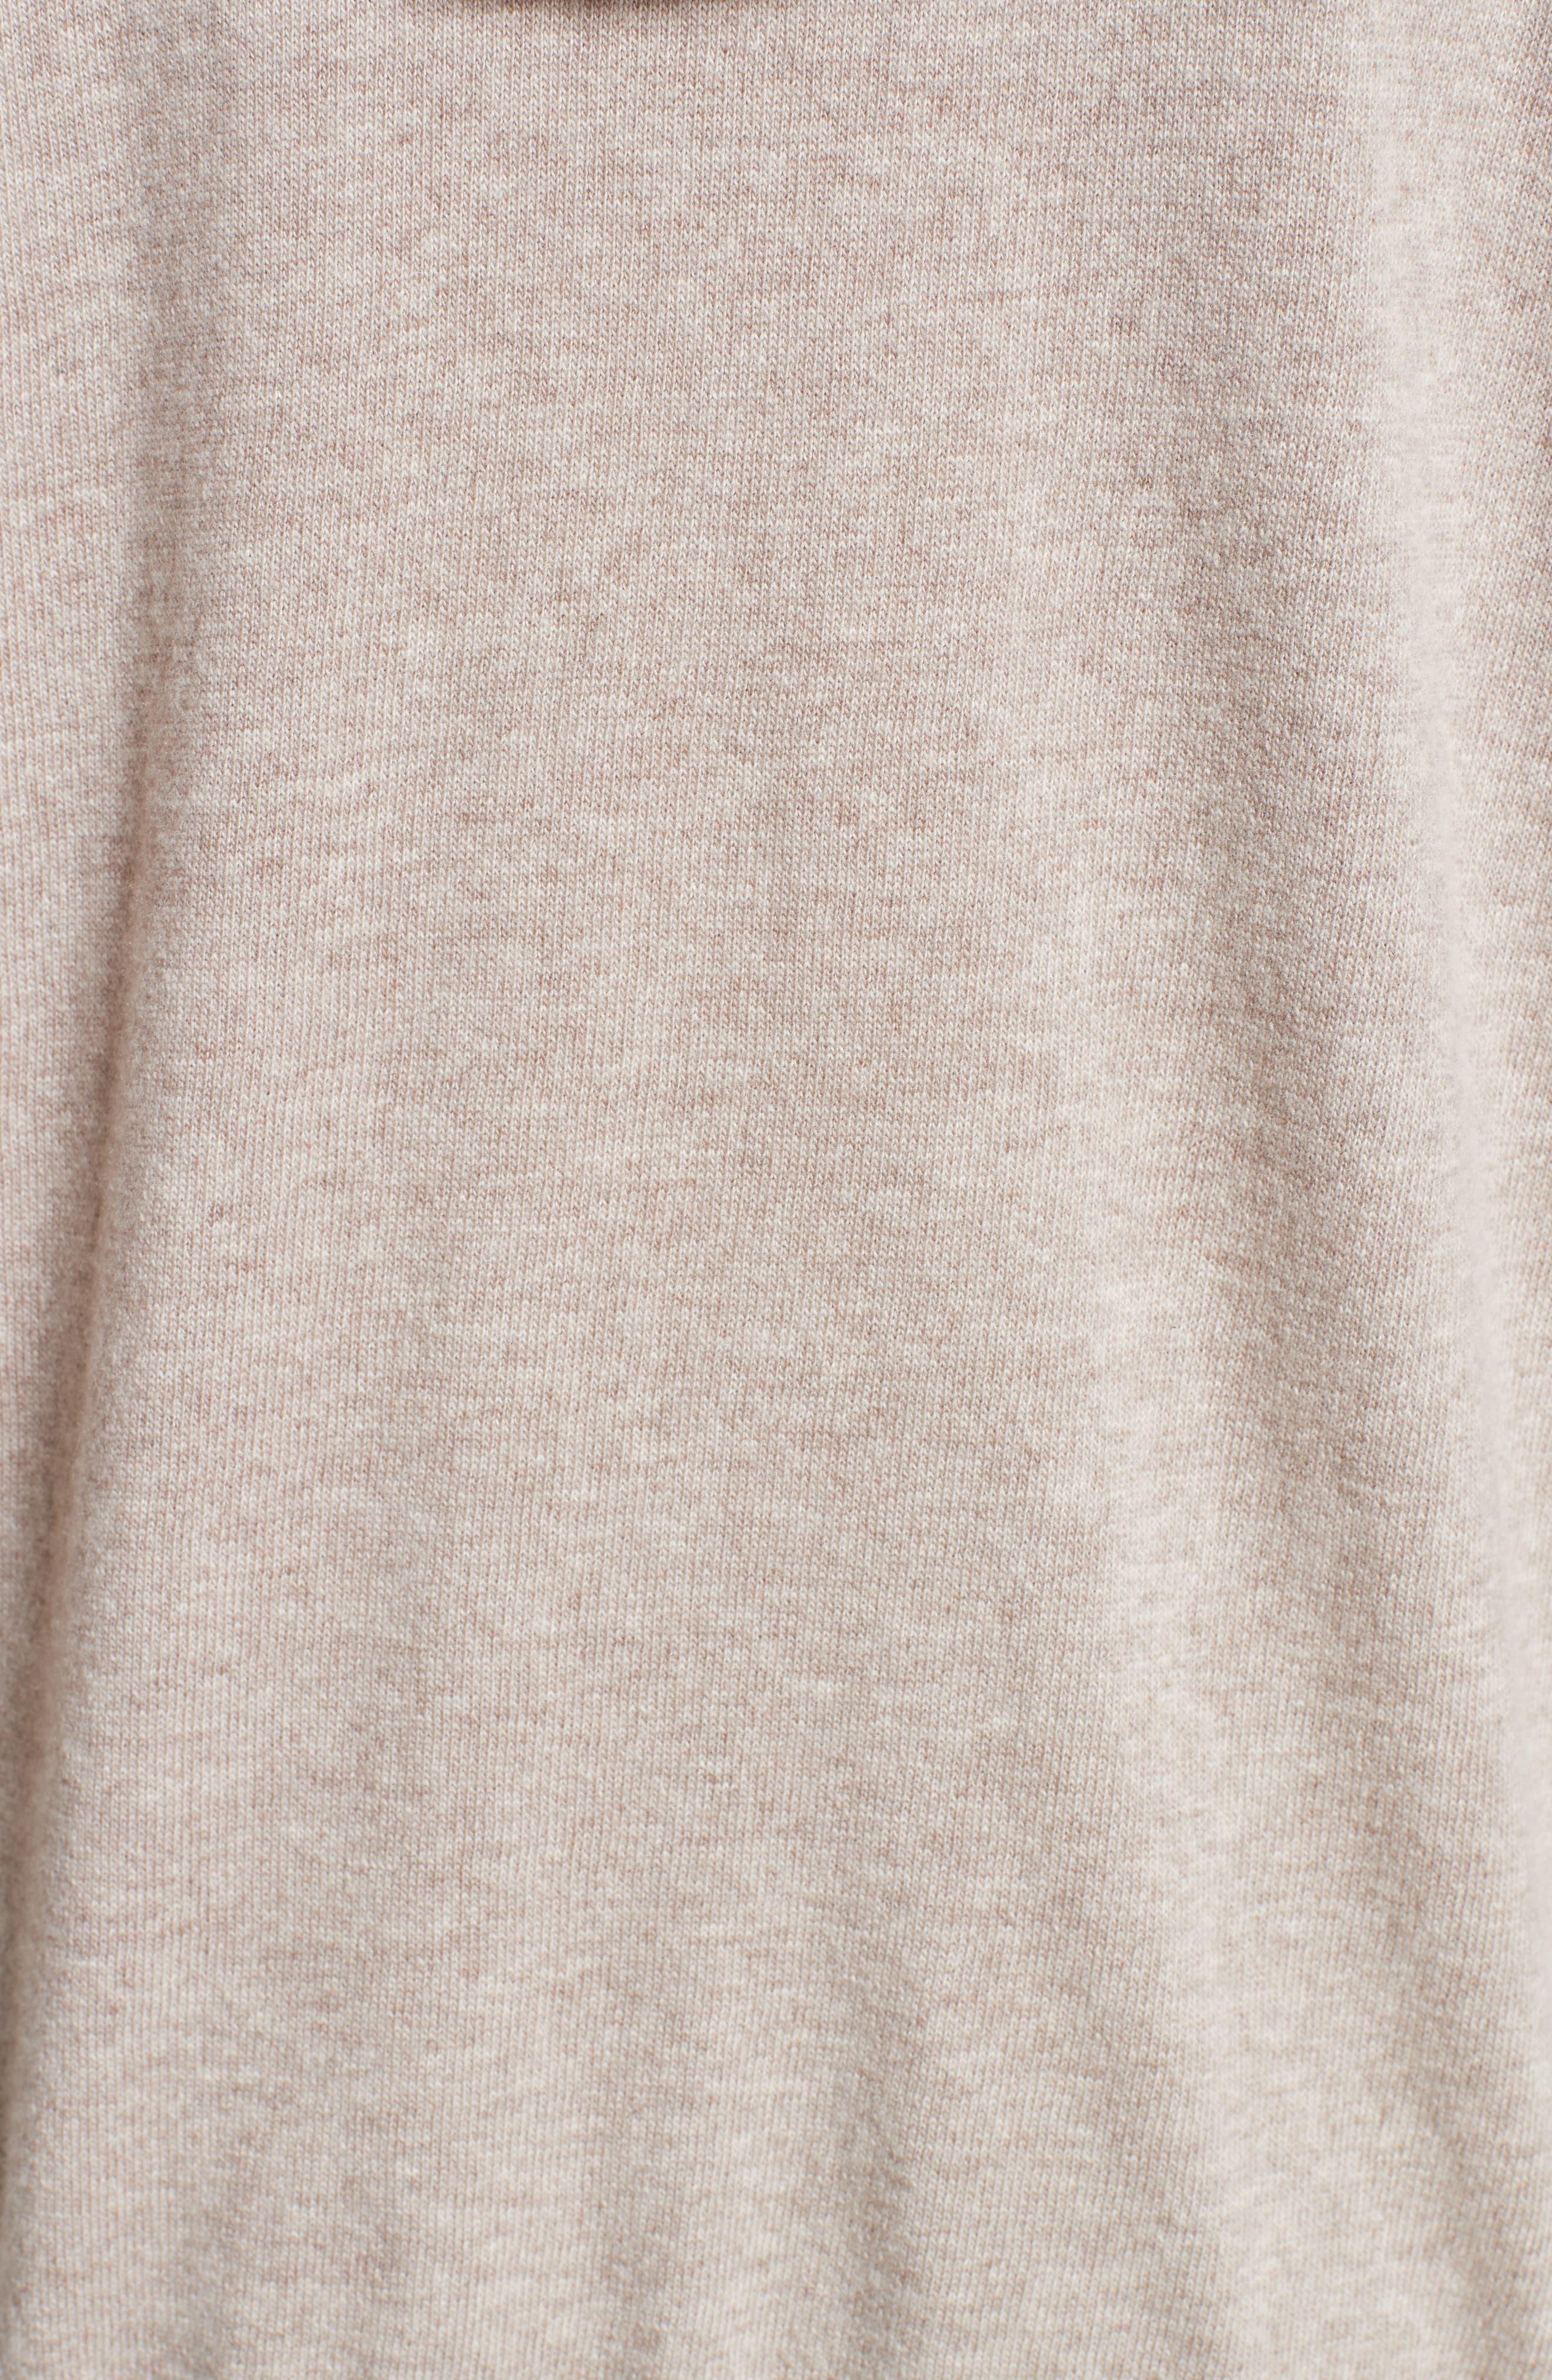 Alternate Image 5  - Max Mara Nitra Wool & Cashmere Hooded Sweater